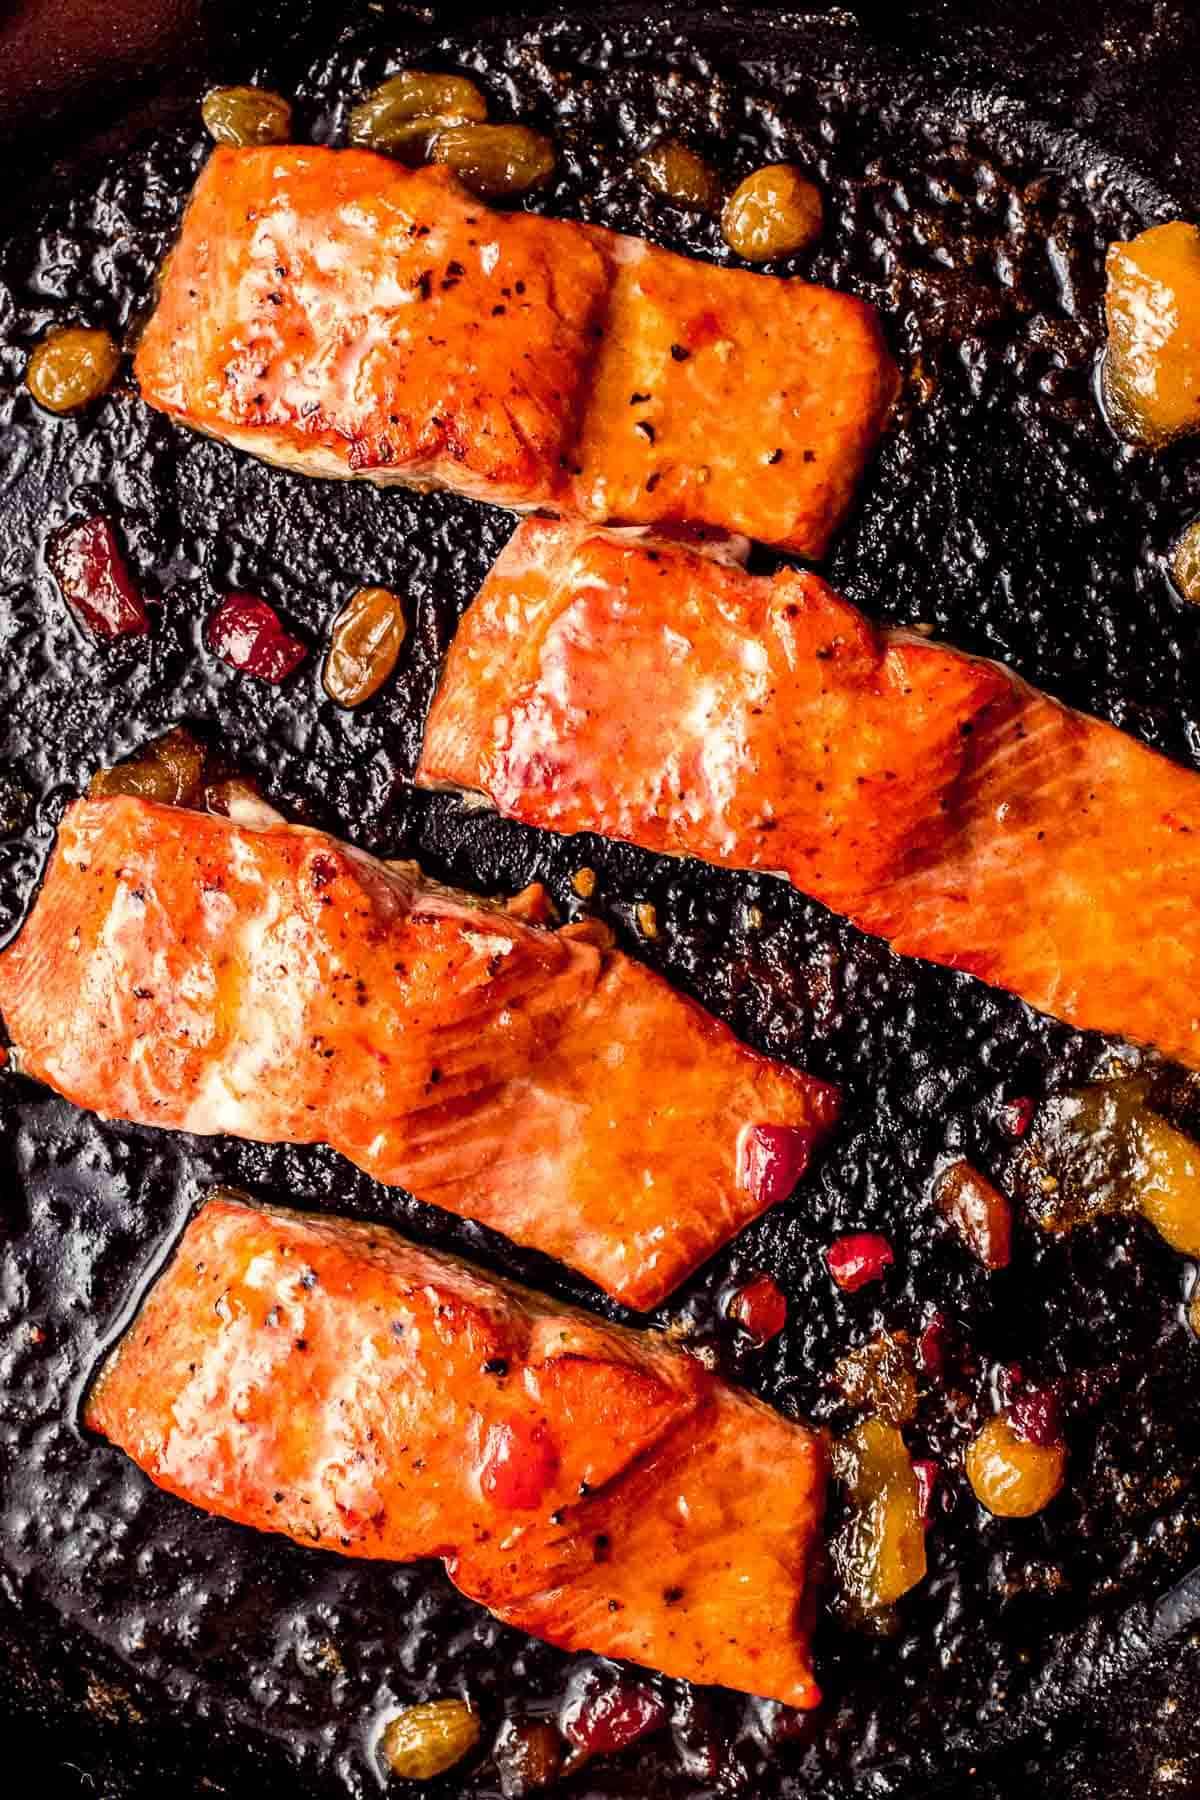 Four pieces of salmon in a skillet glazed with mango chutney.